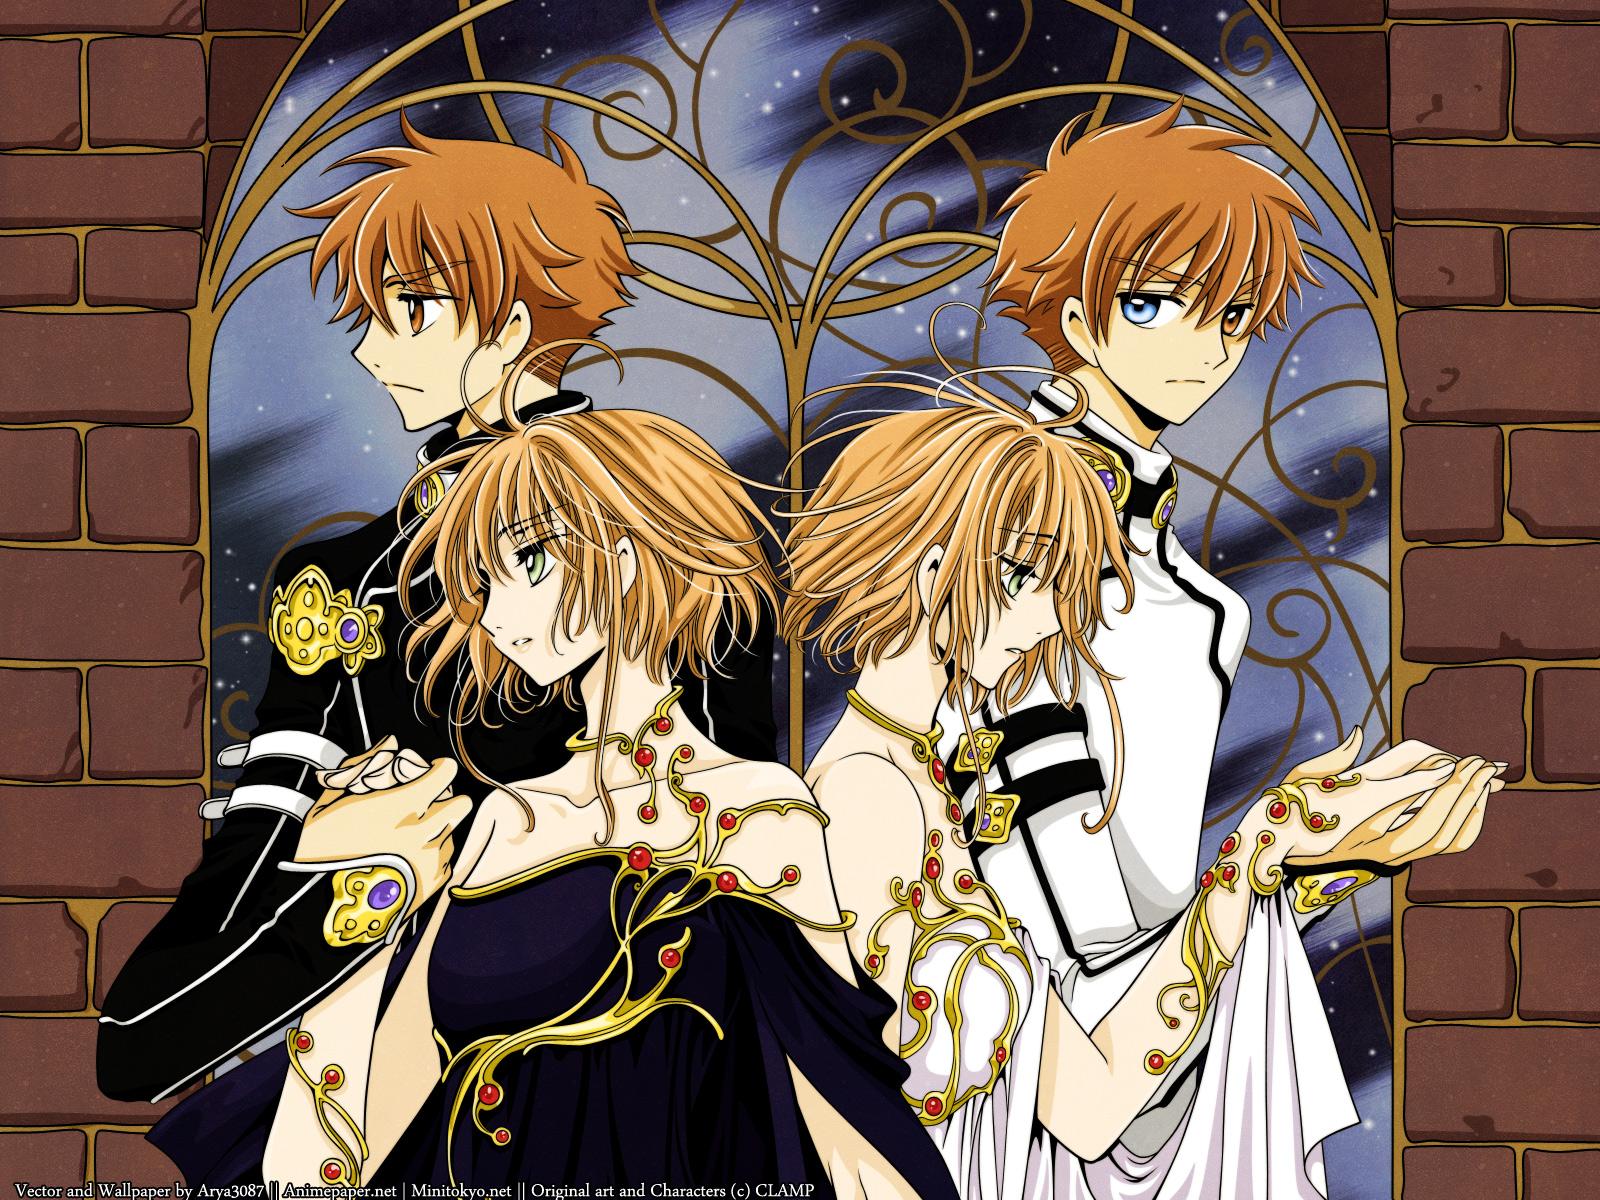 http://3.bp.blogspot.com/-o23zE7Ui3JA/UChHKOavqRI/AAAAAAAAA6A/q5Tg_a1LHtA/s1600/animepaperwallpapers_tsubasa-chronicle_arya3087133_1600x1200_74460.jpg